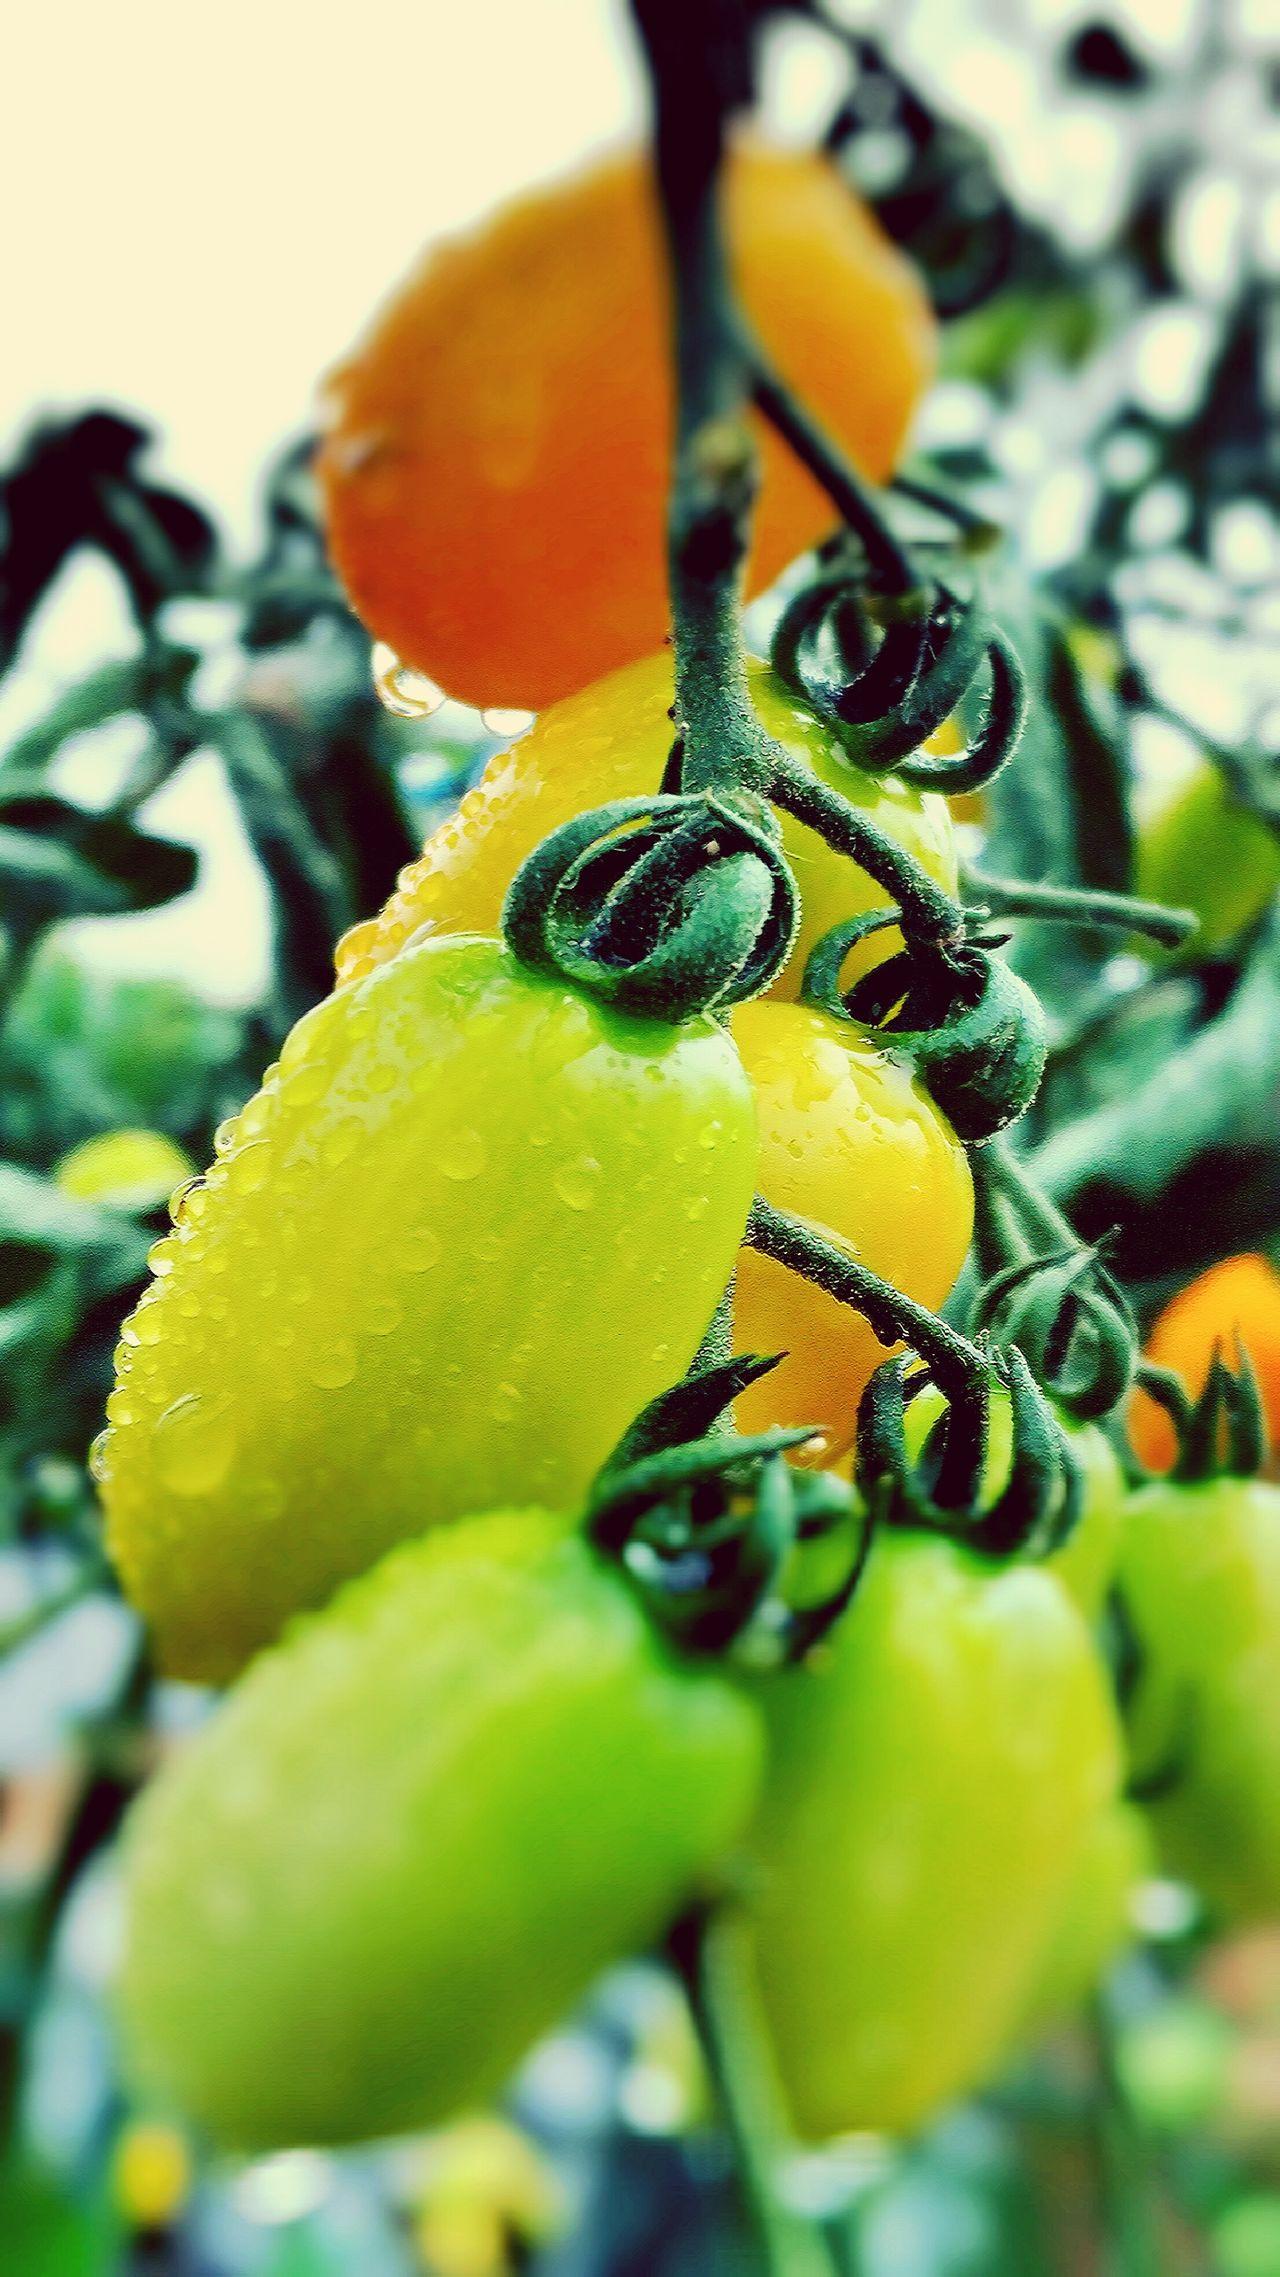 Cherry Tomato Tomato Field Rain Drops Growing Vegtables Rainy Days